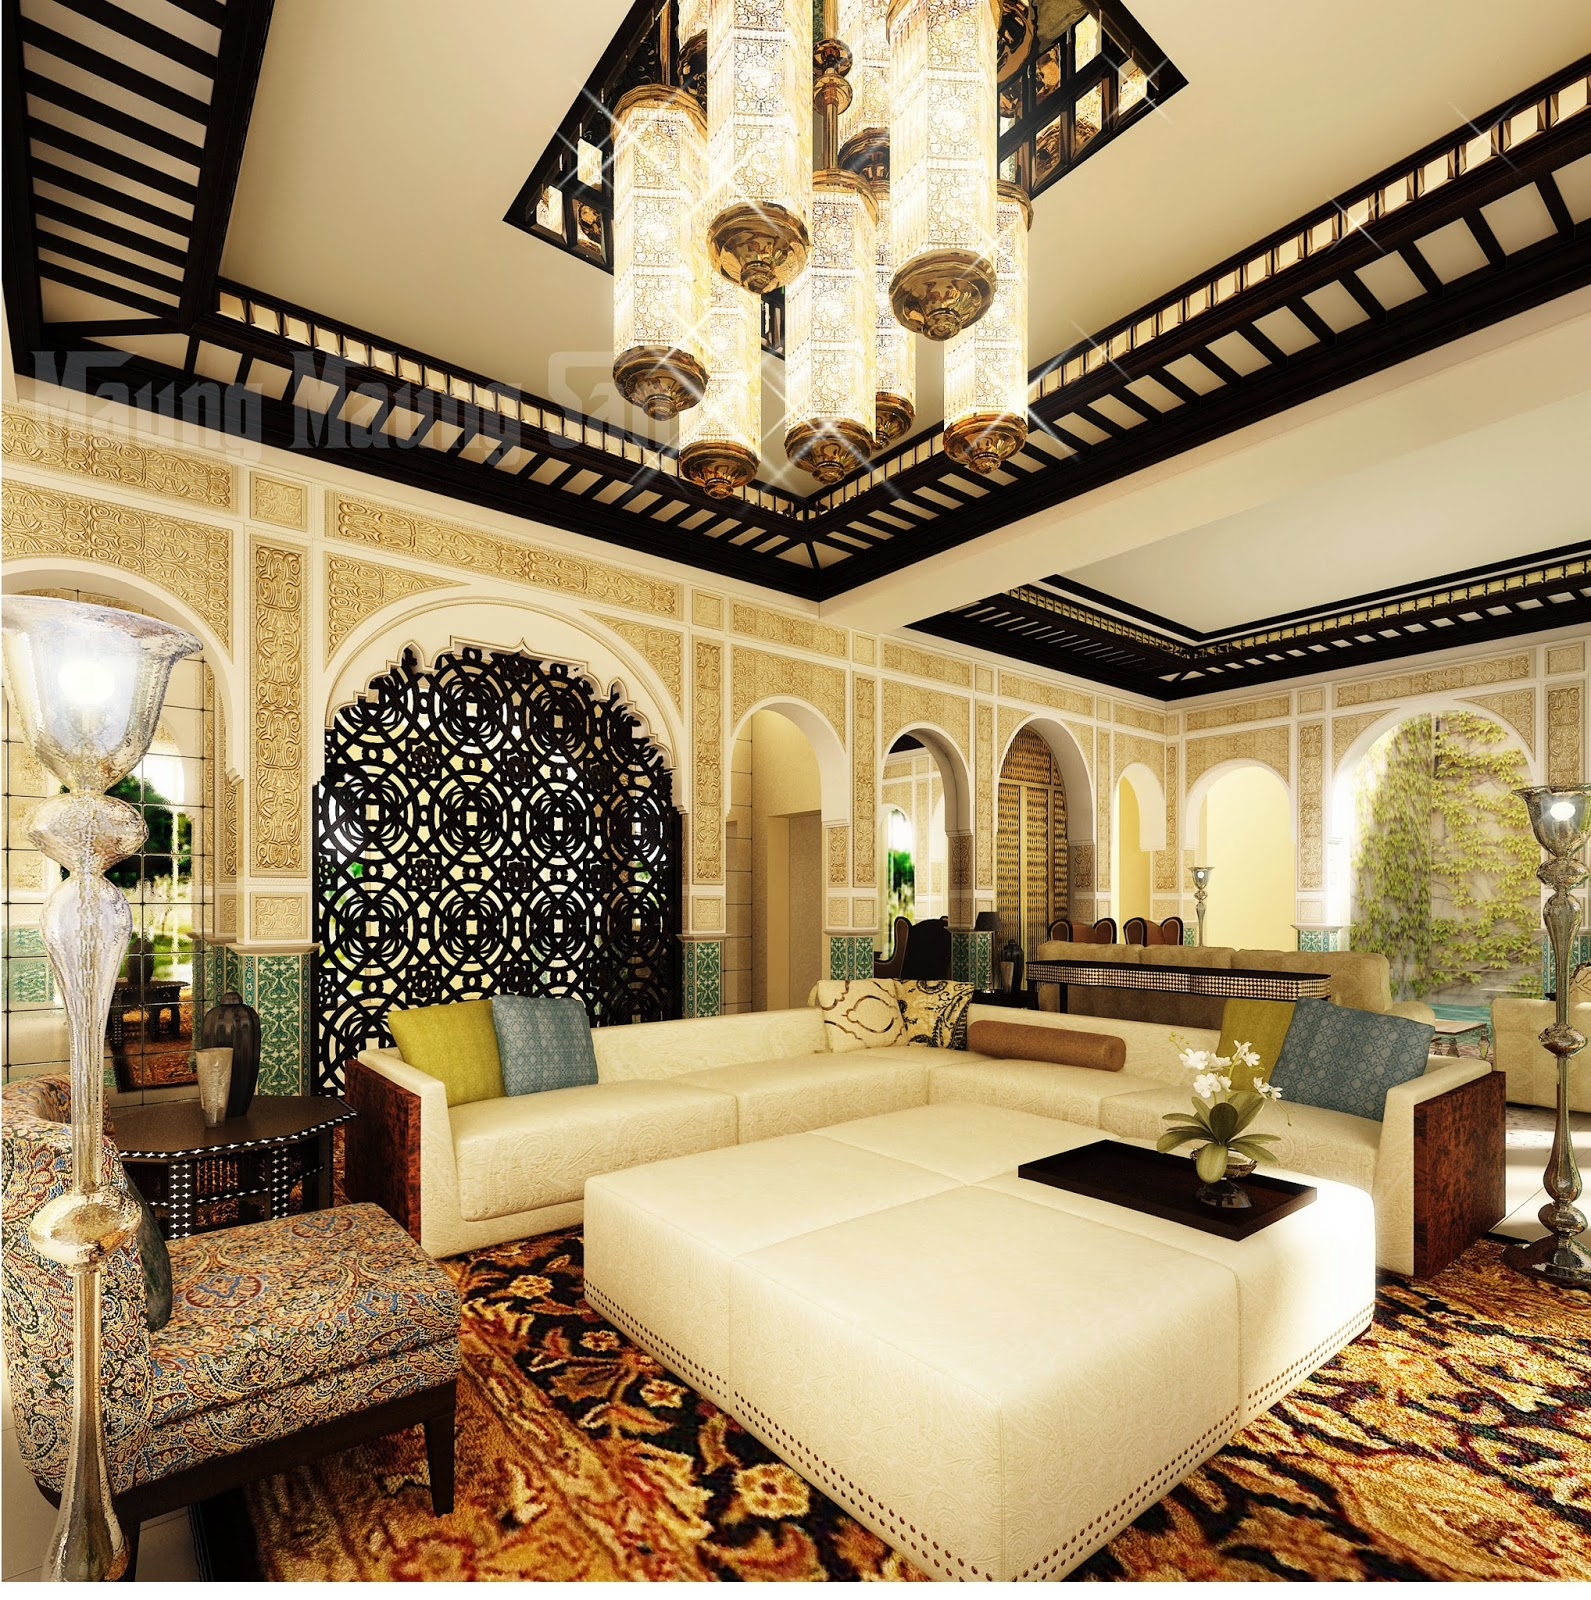 conseils d co et relooking mai 2014. Black Bedroom Furniture Sets. Home Design Ideas